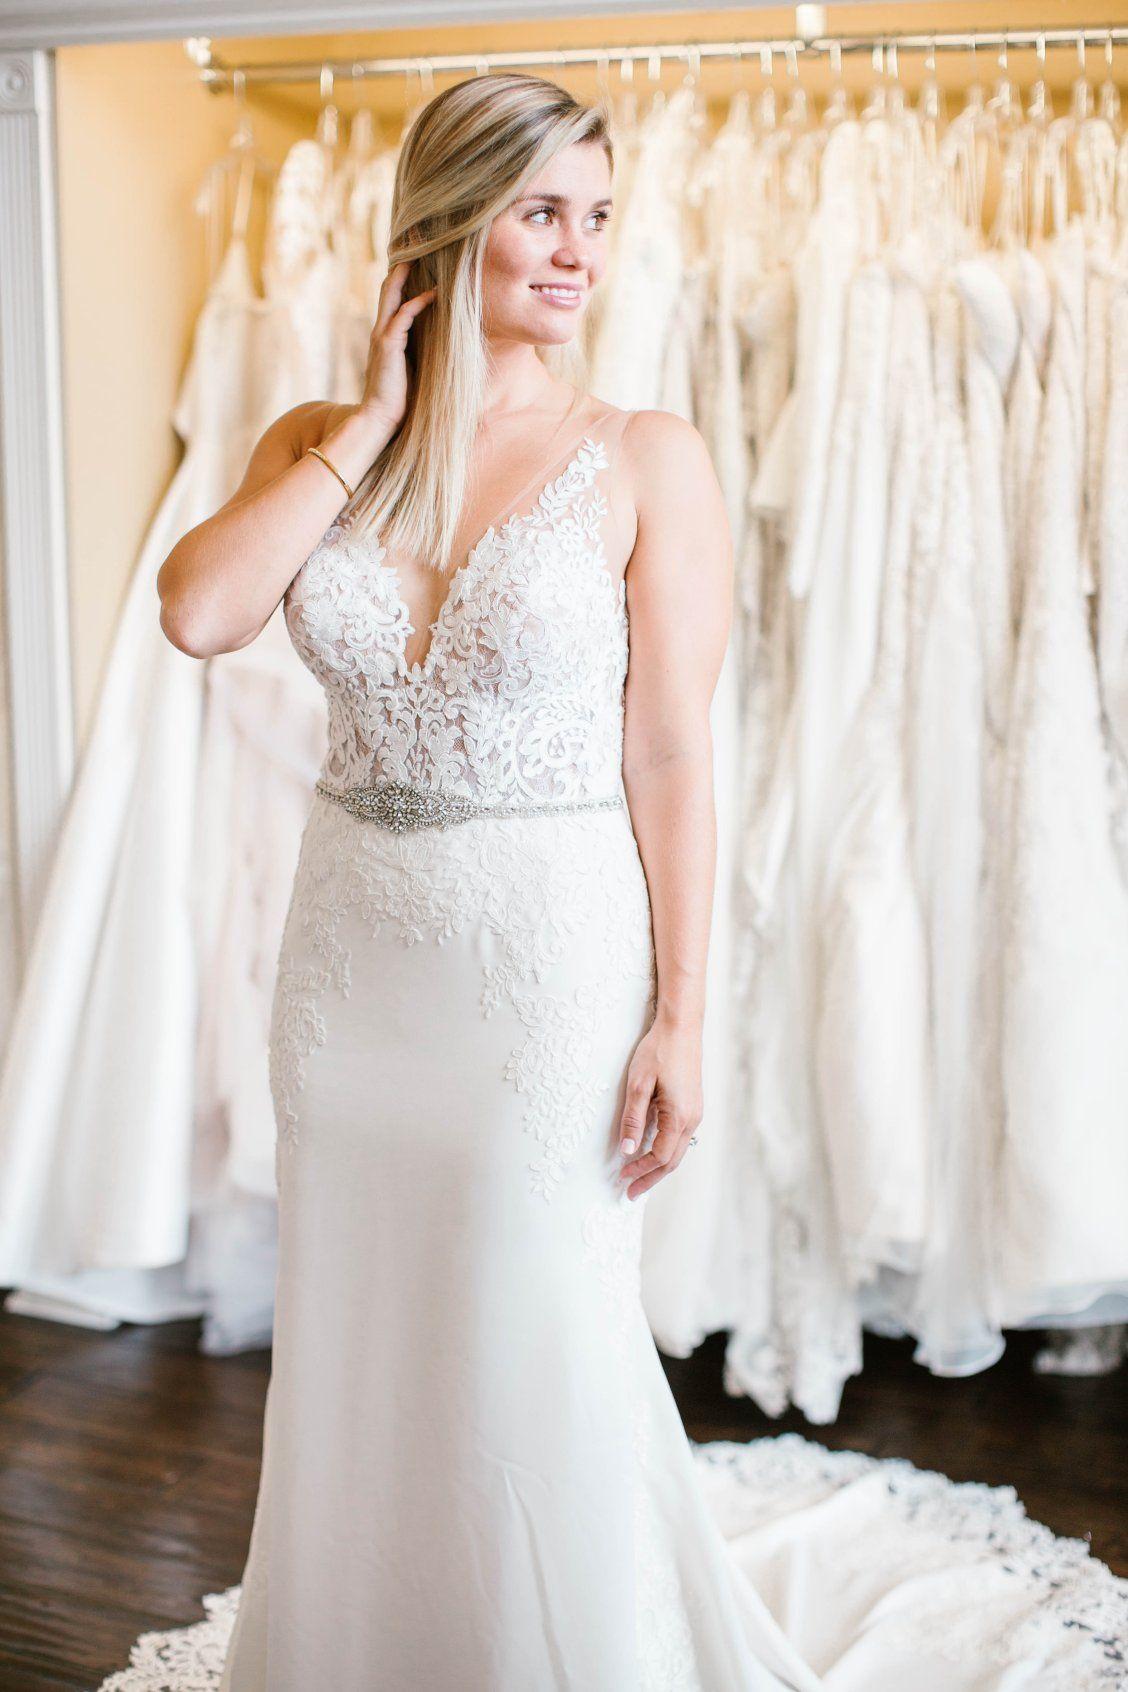 Simple and Sleek Wedding Gown   Stella york, Wedding dress and Wedding